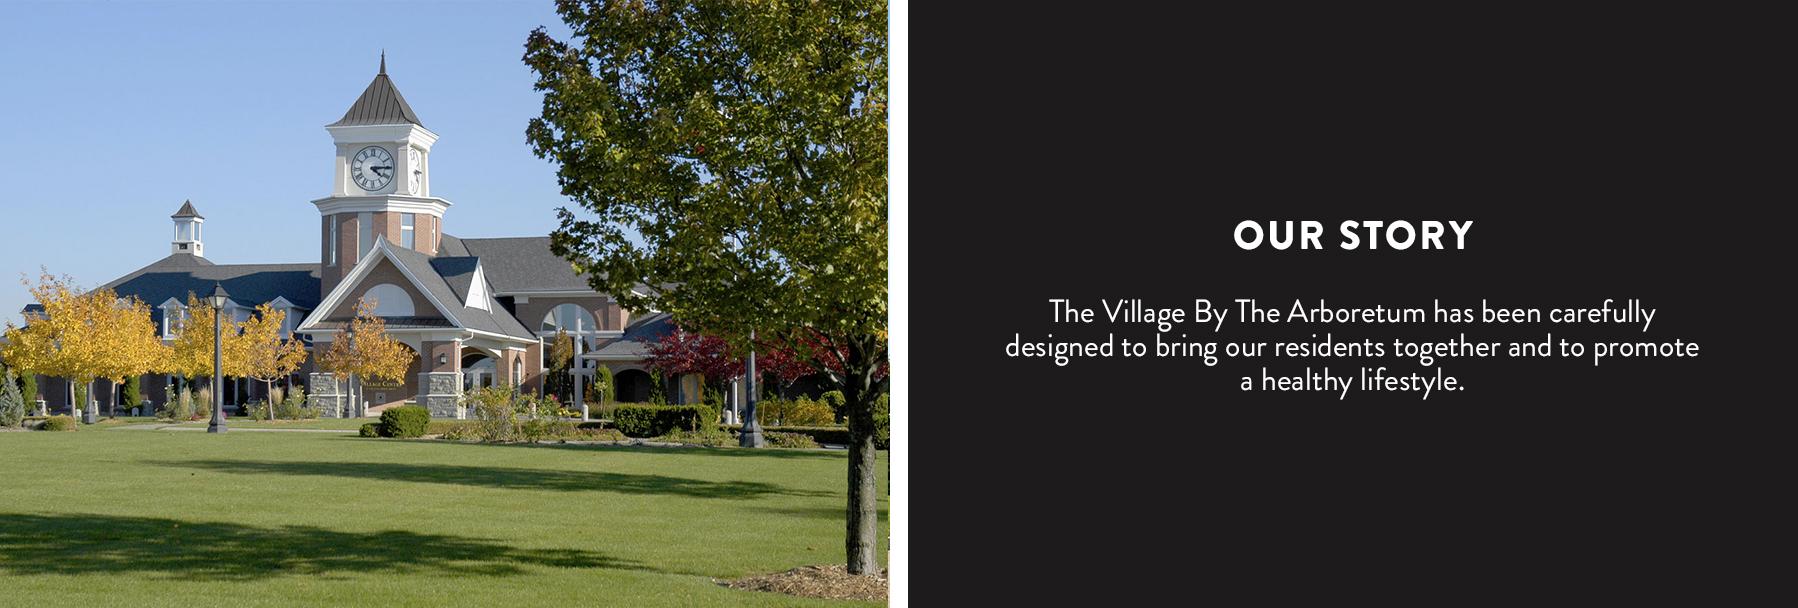 Village By The Arboretum